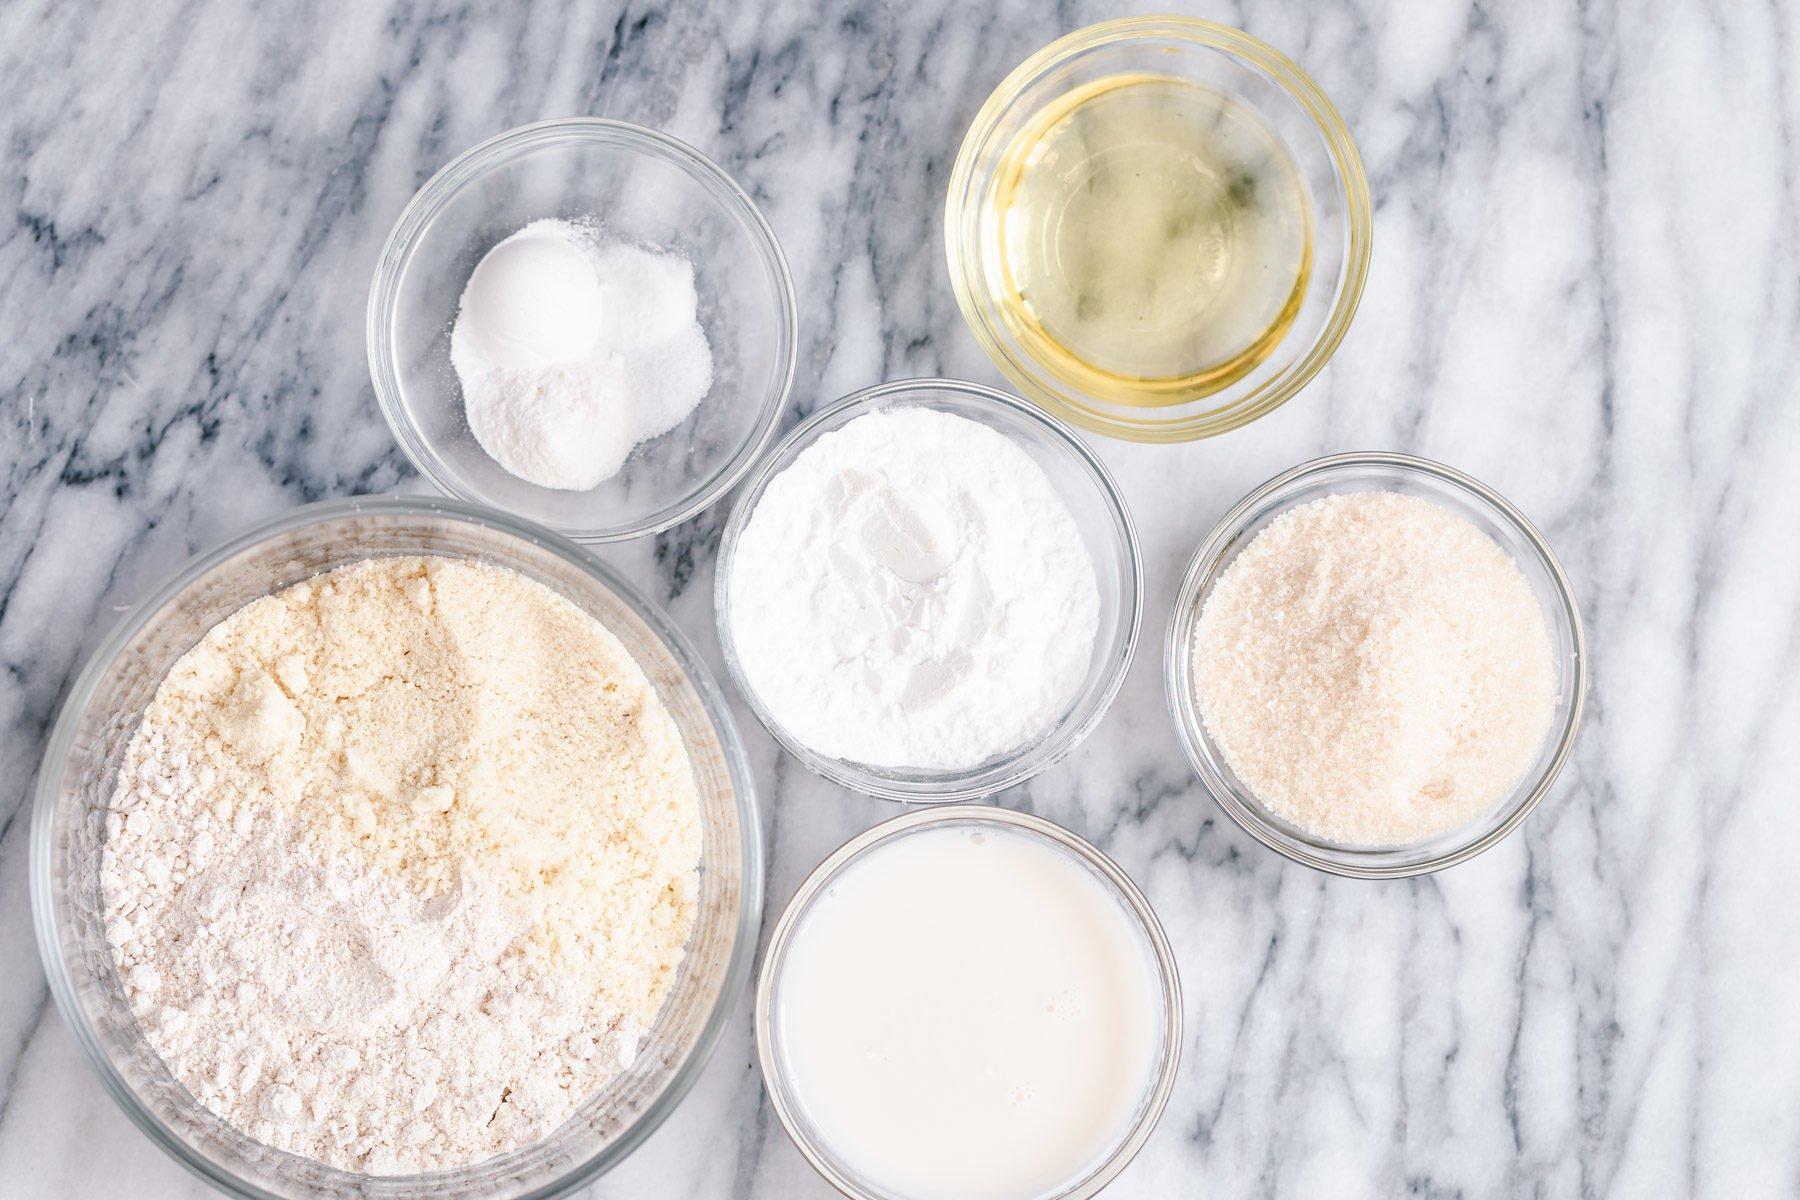 ingredients needed for making glutenfree vanilla donuts recipe